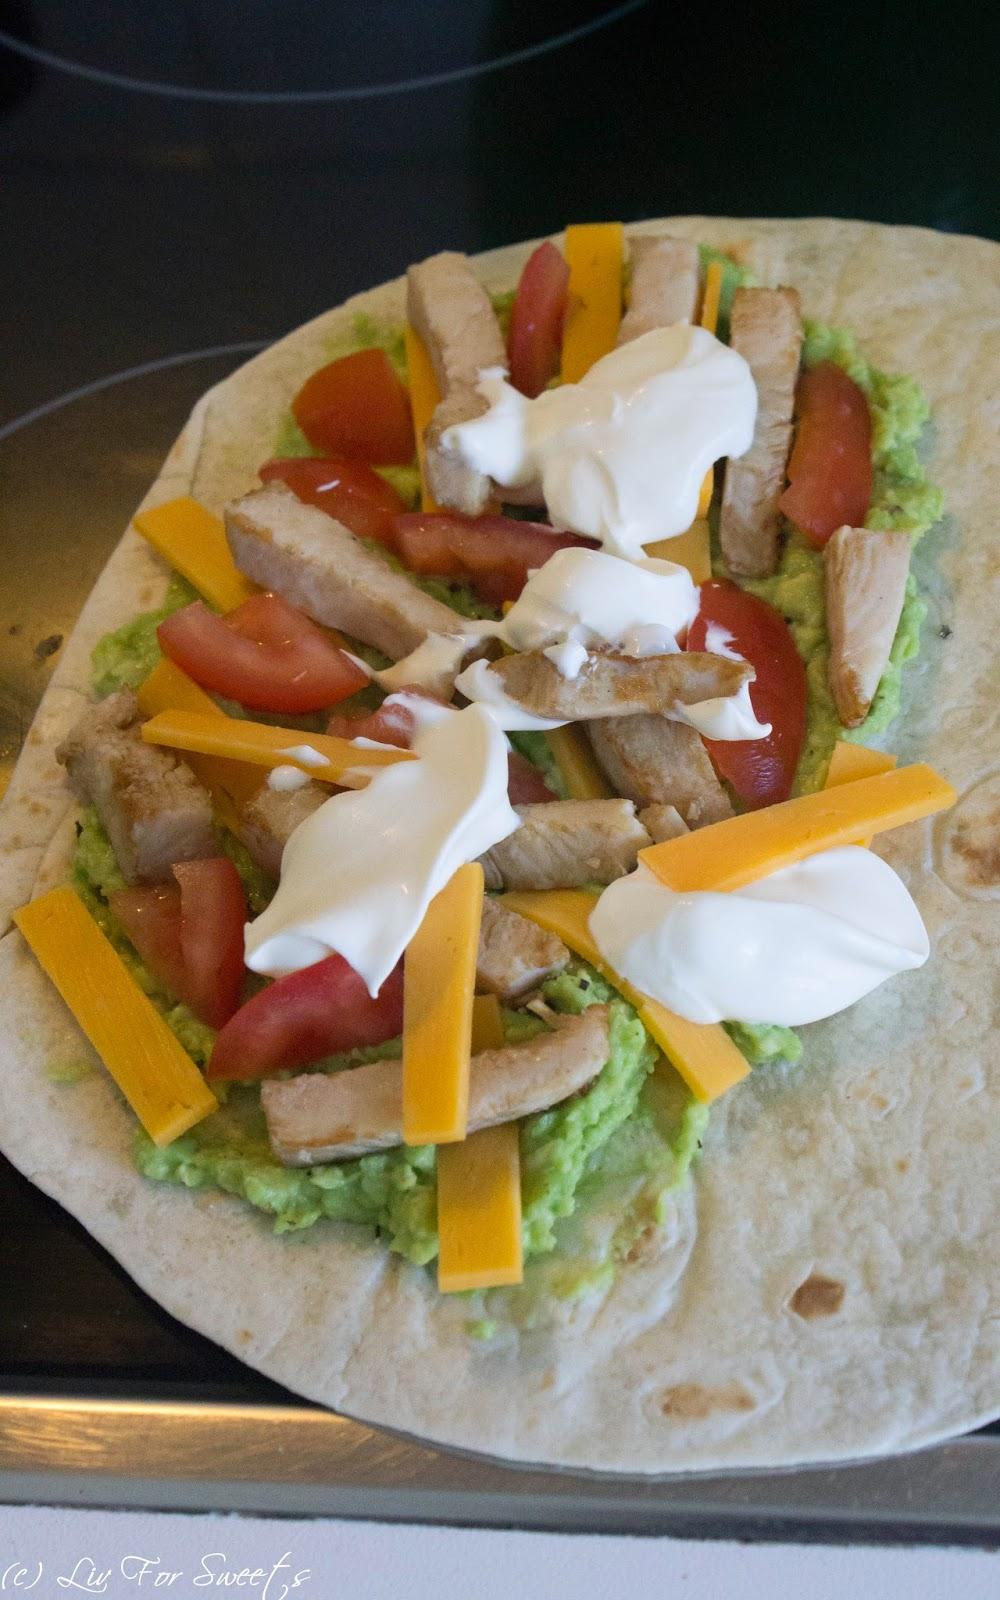 Tortilla, Avocado, Cheddar, Hähnchenstreifen, Creme Fraiche, Tomate, Quesadilla